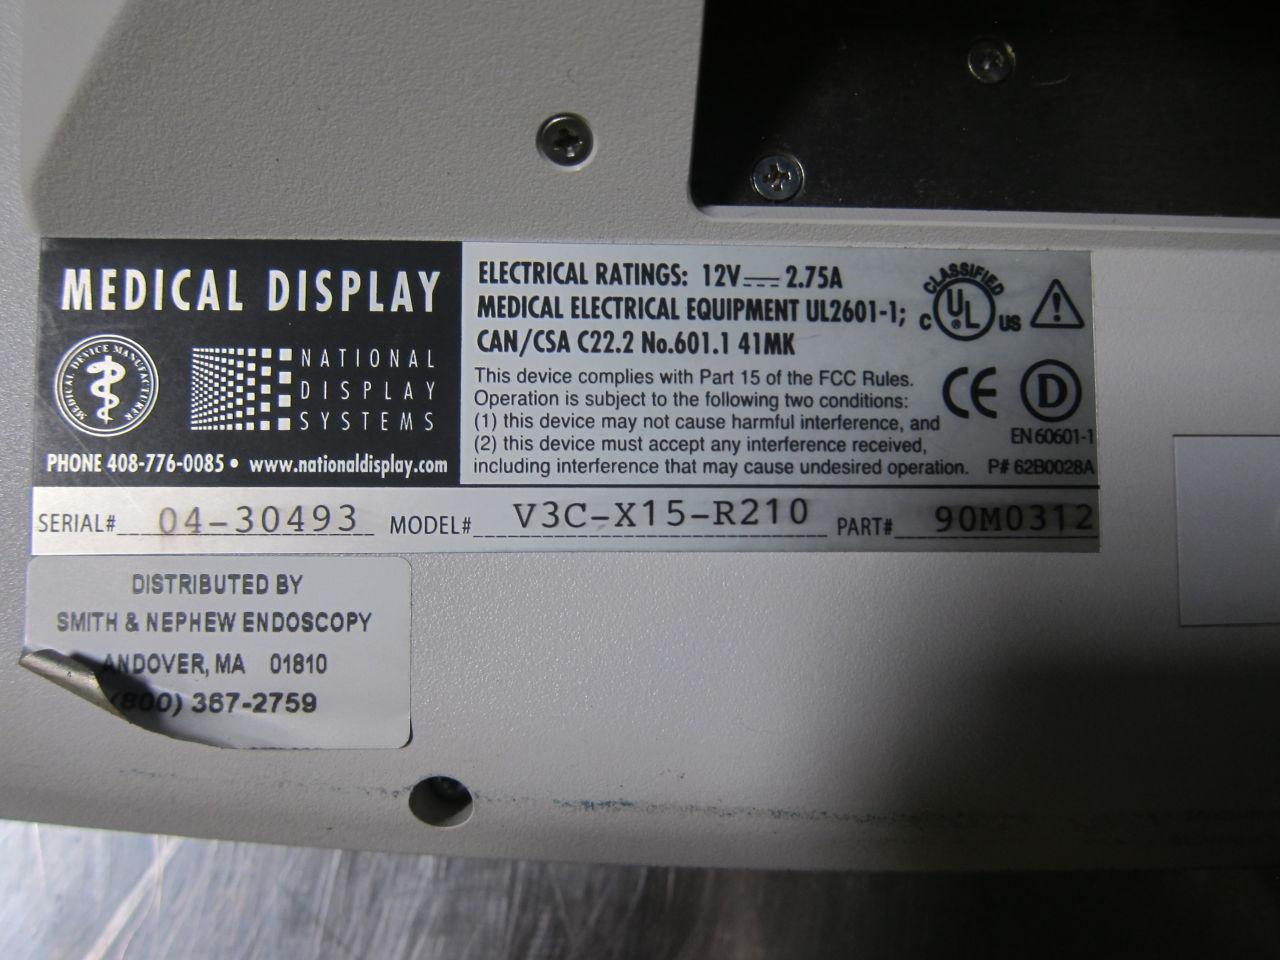 NATIONAL DISPLAY V3C-X15-R210 Display Monitor